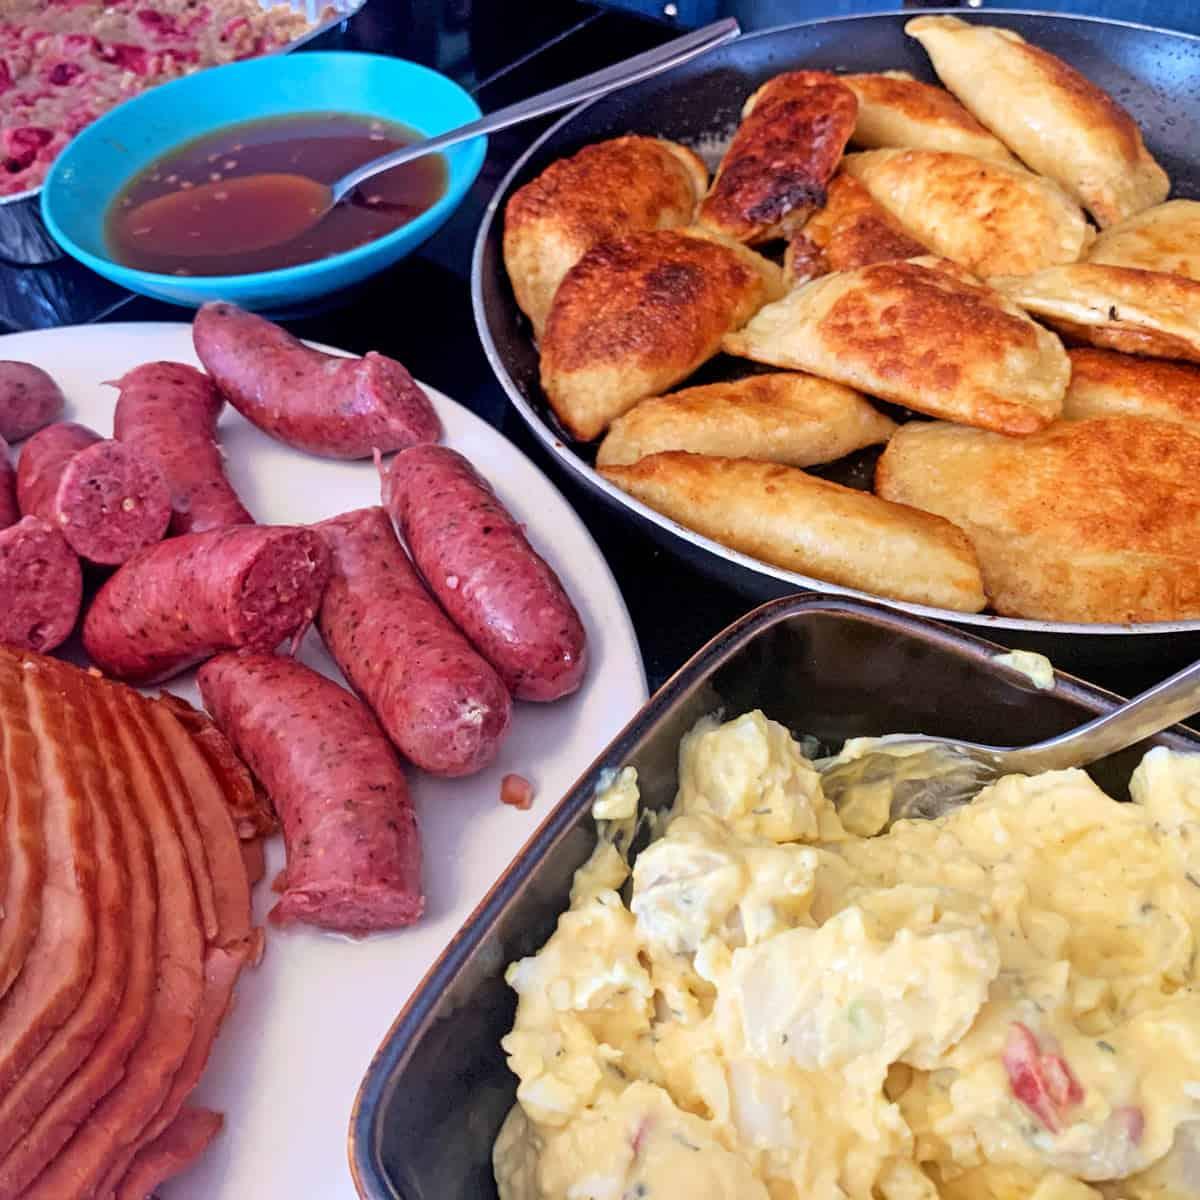 A pan of pierogies with Polish sausage and potato salad and ham.